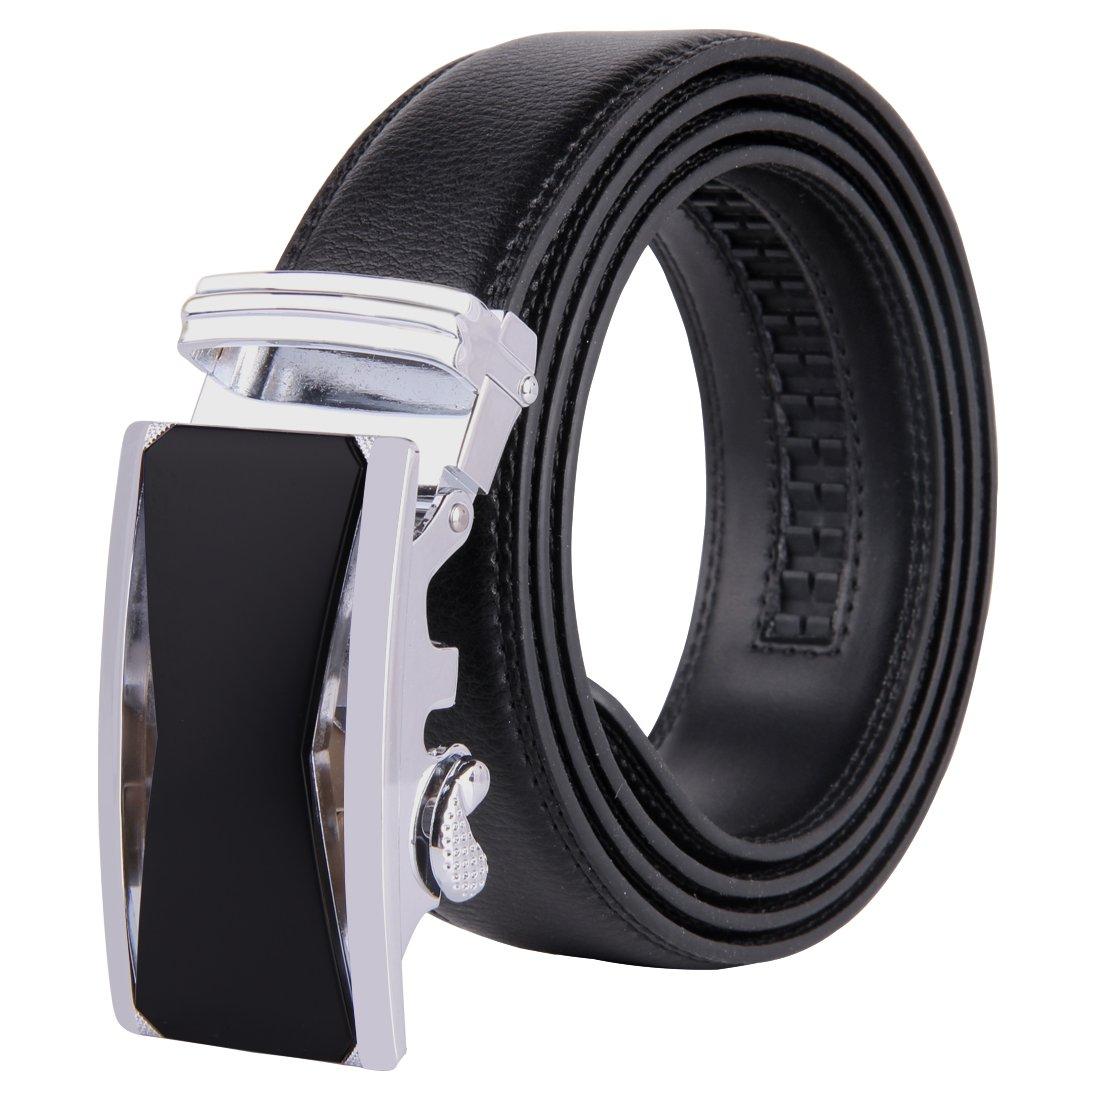 JINIU Men's Leather Belt Automatic Buckle 35mm Ratchet Dress Black Belts Boxed JINIU-Belts-b1-KT1